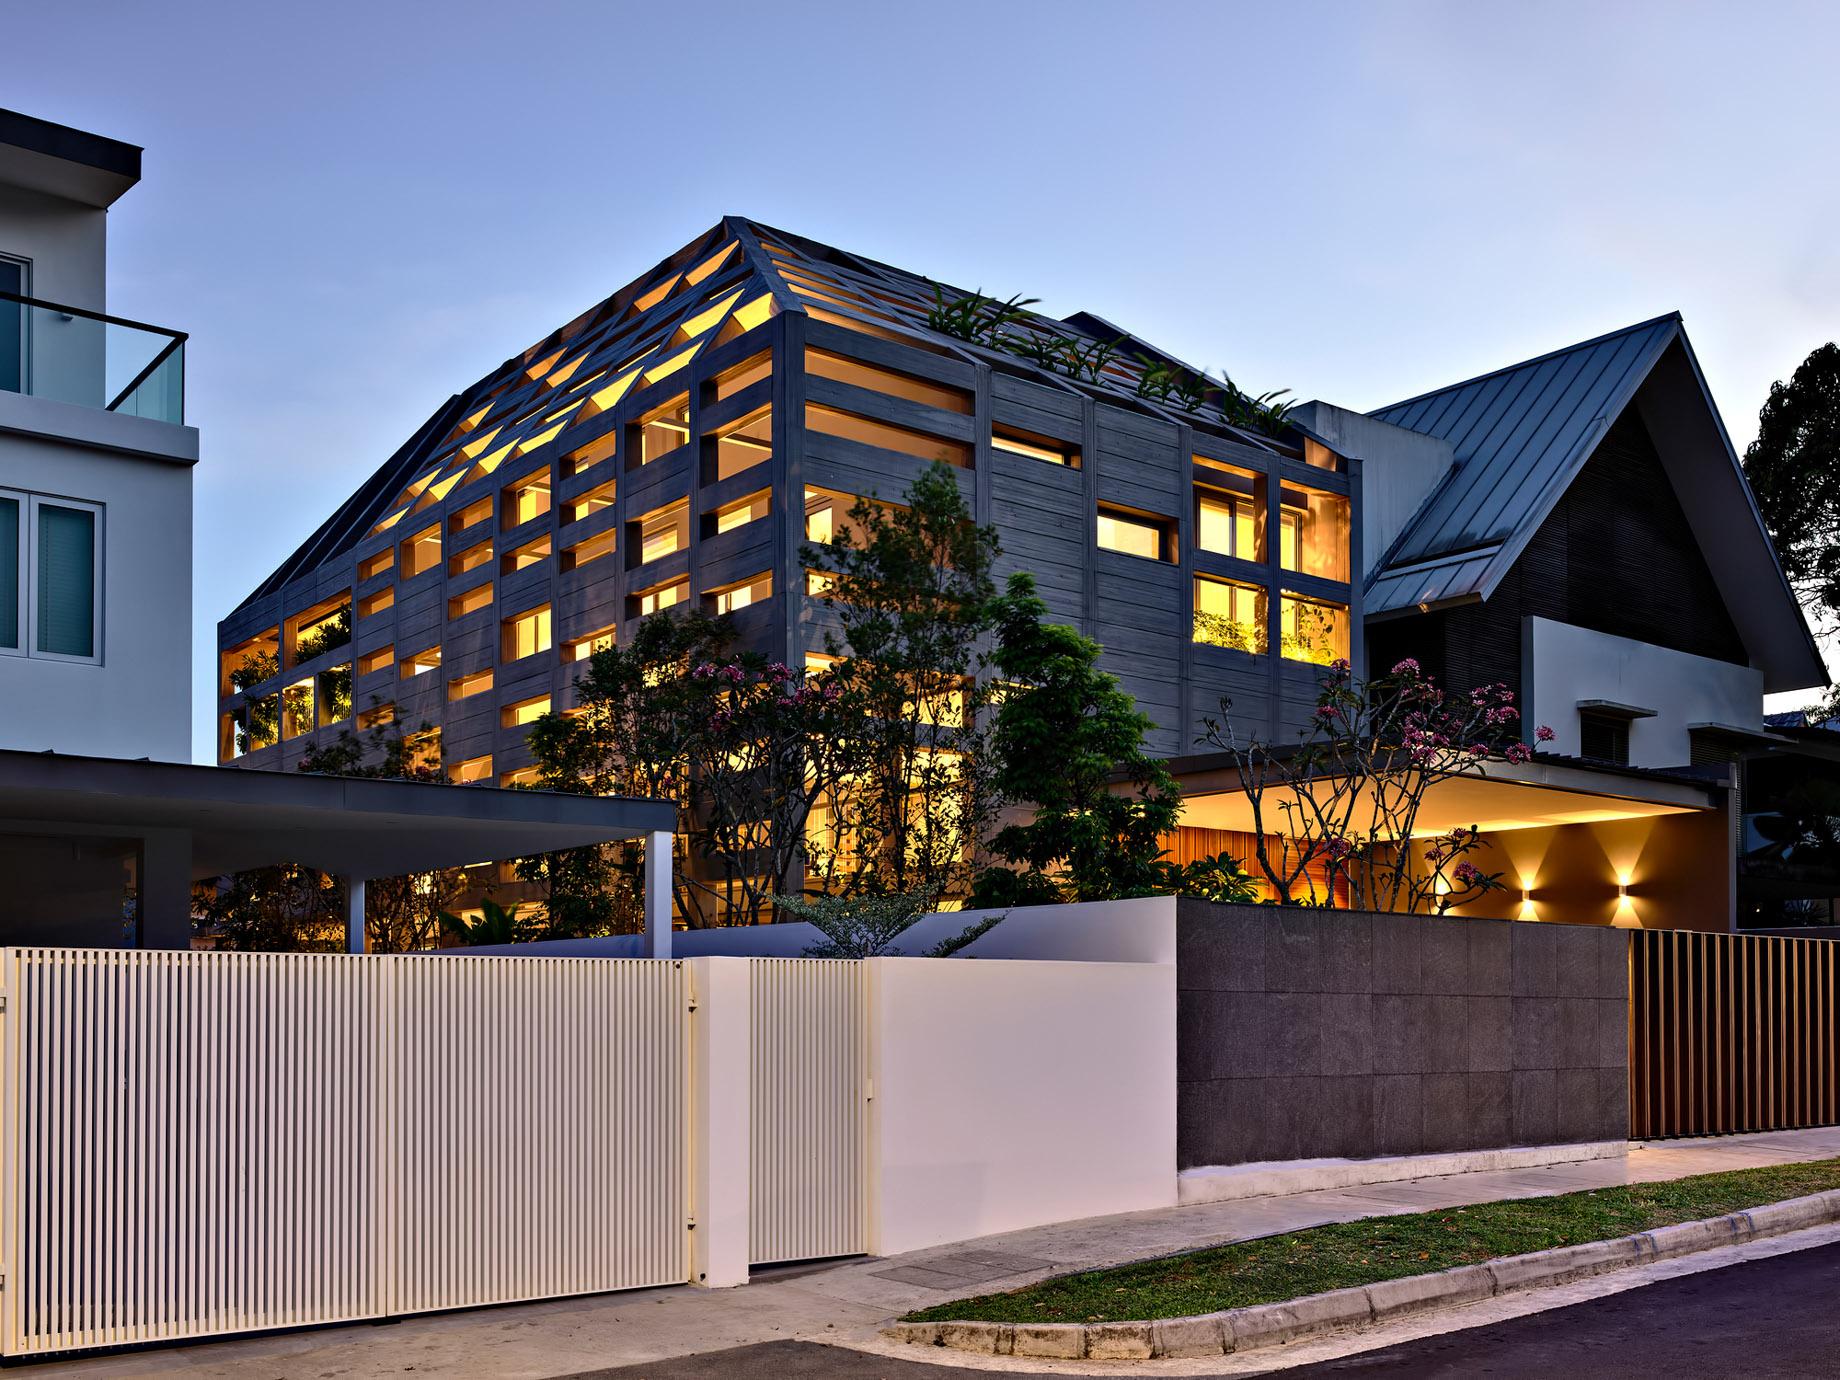 Concrete Light House Residence - Greenleaf Drive, Singapore